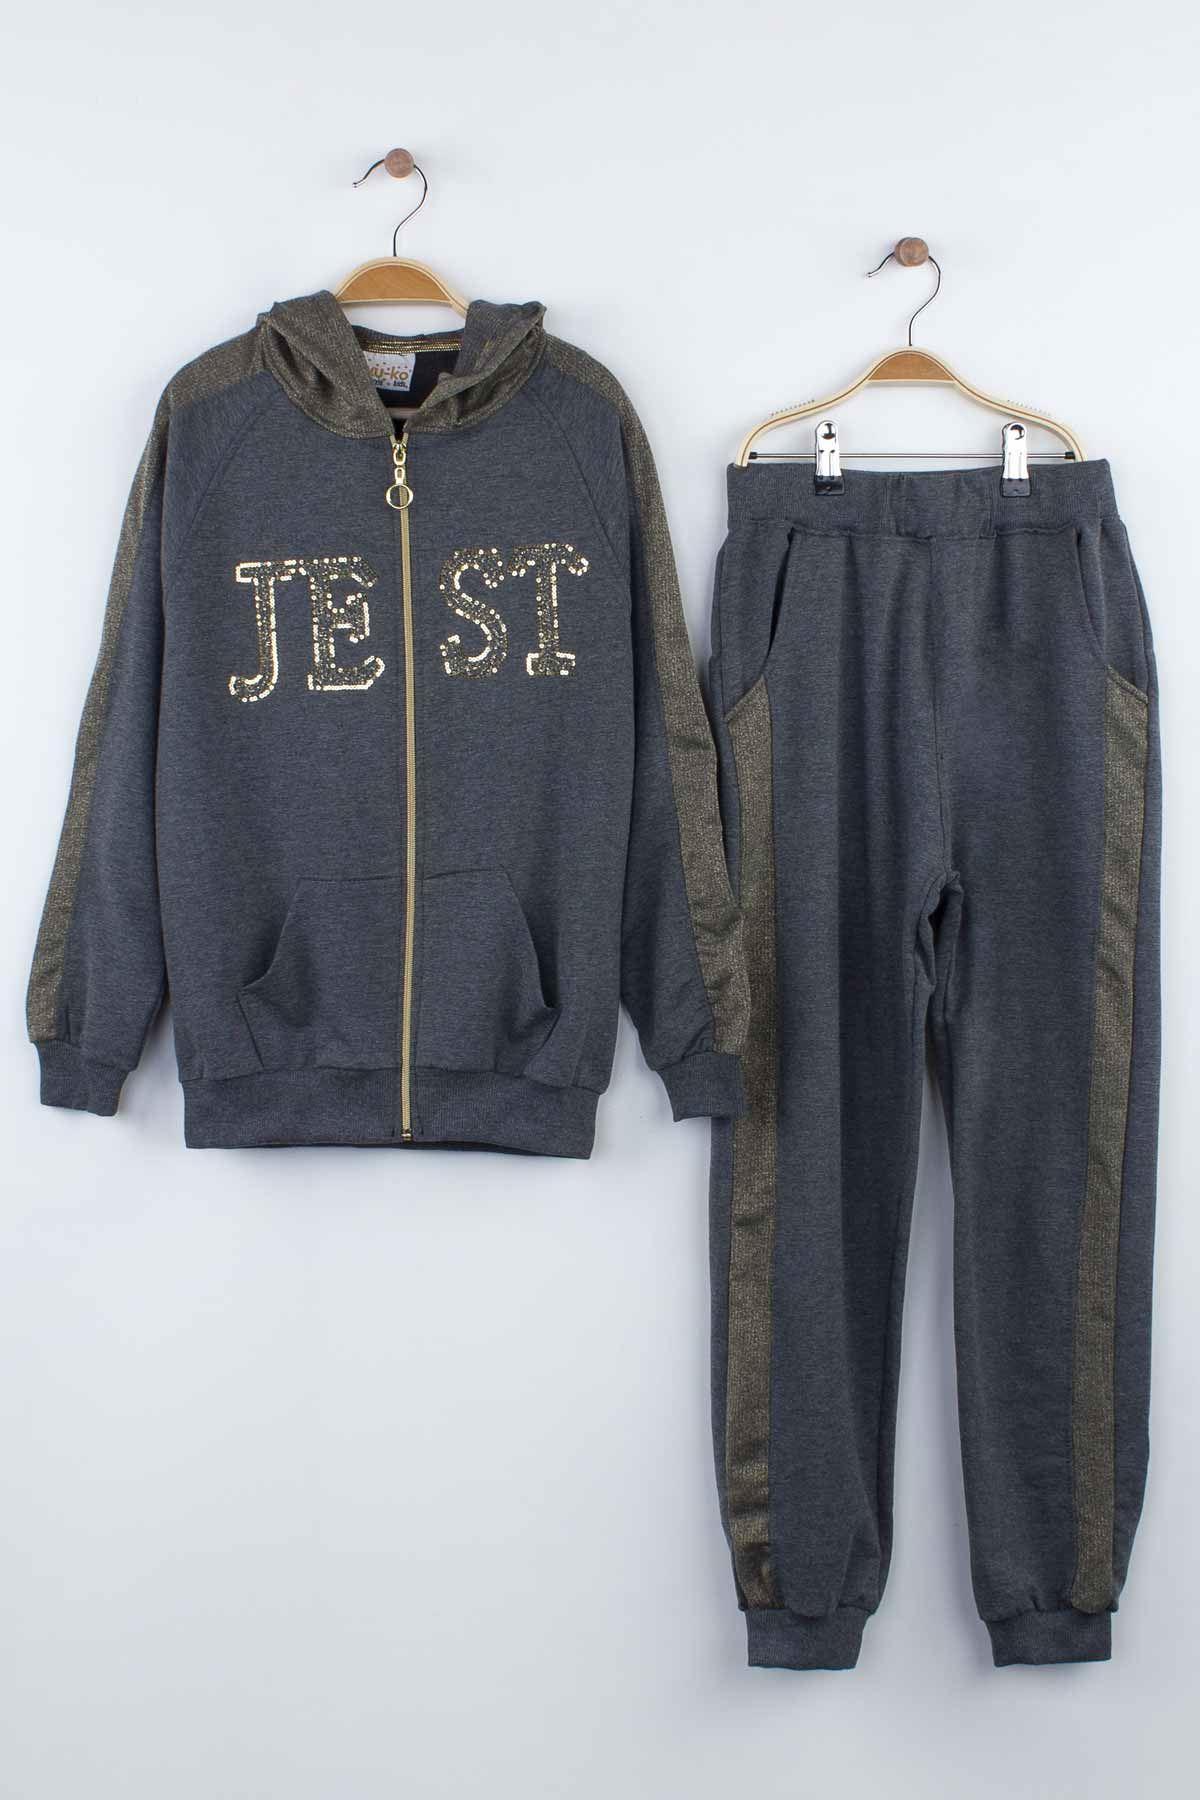 Grey girls seasonal bottom tracksuit top hooded sweat 2 piece tracksuit set models